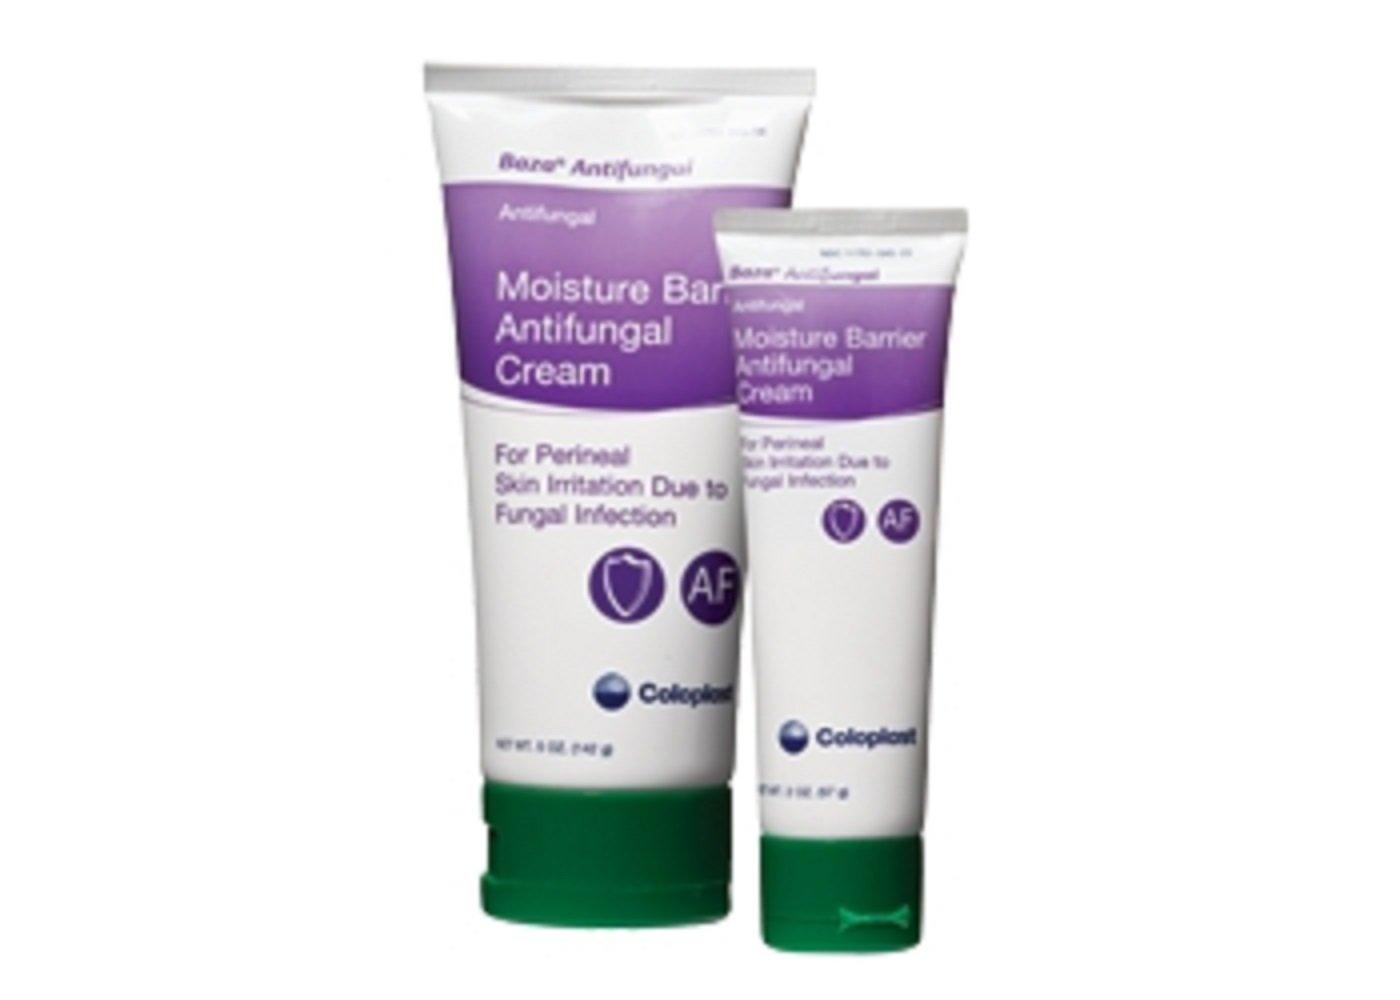 Baza - Antifungal - 2% Strength Cream - 300/Case - 4 Gram Individual Packet - McK by Baza